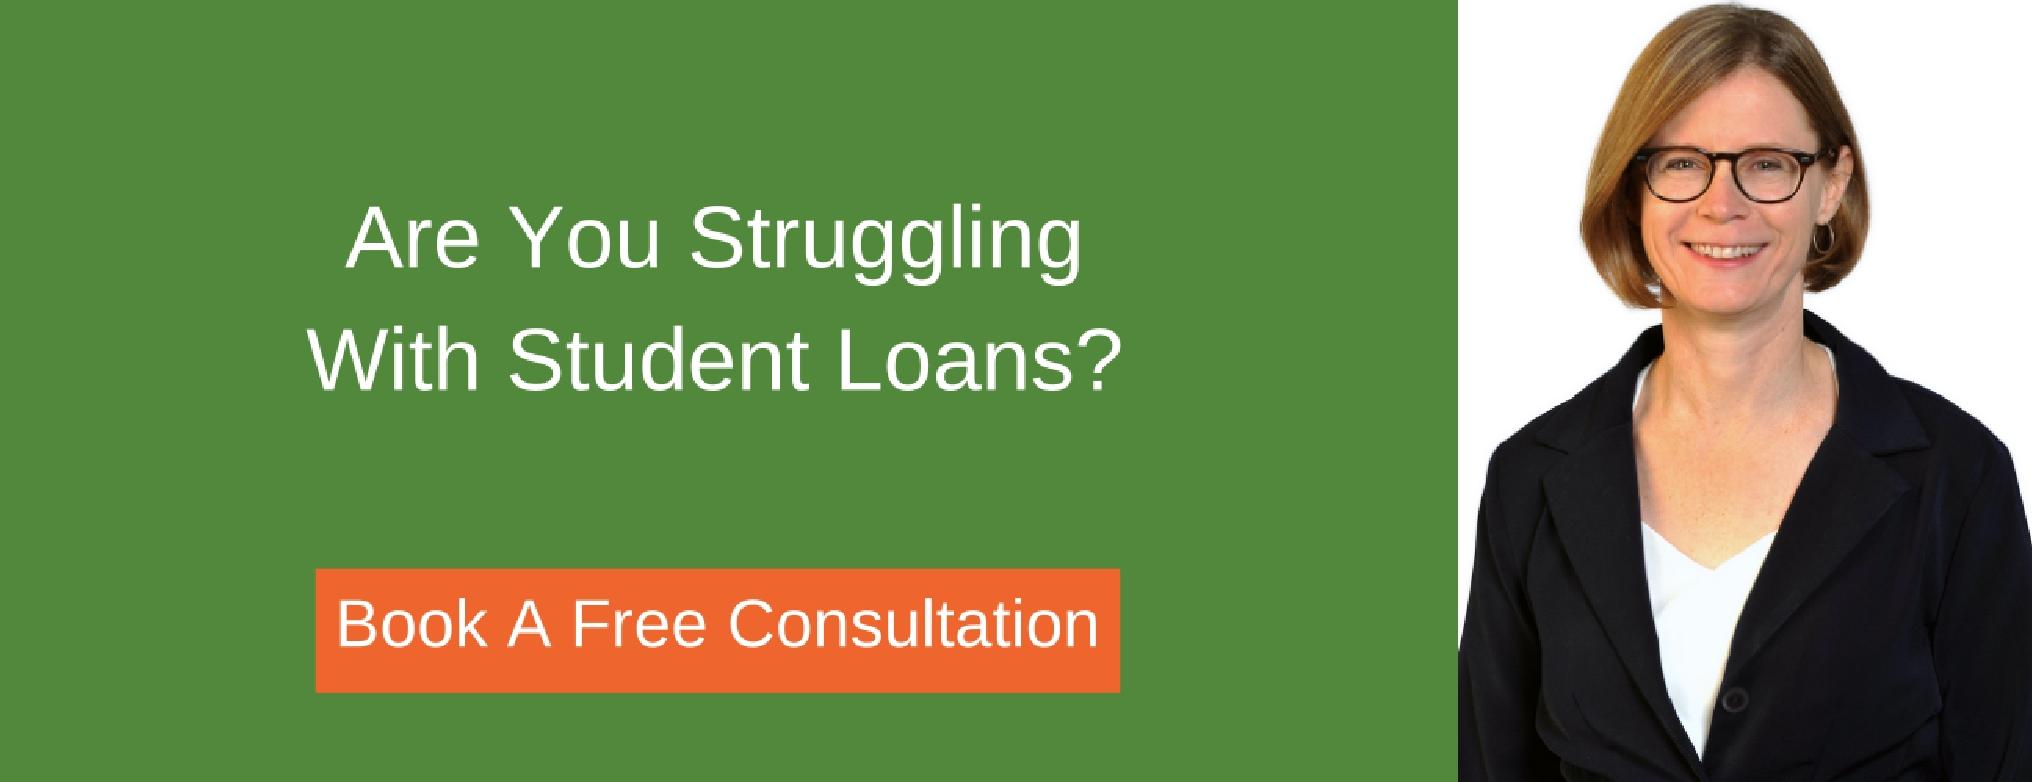 student-loans-meg-cta